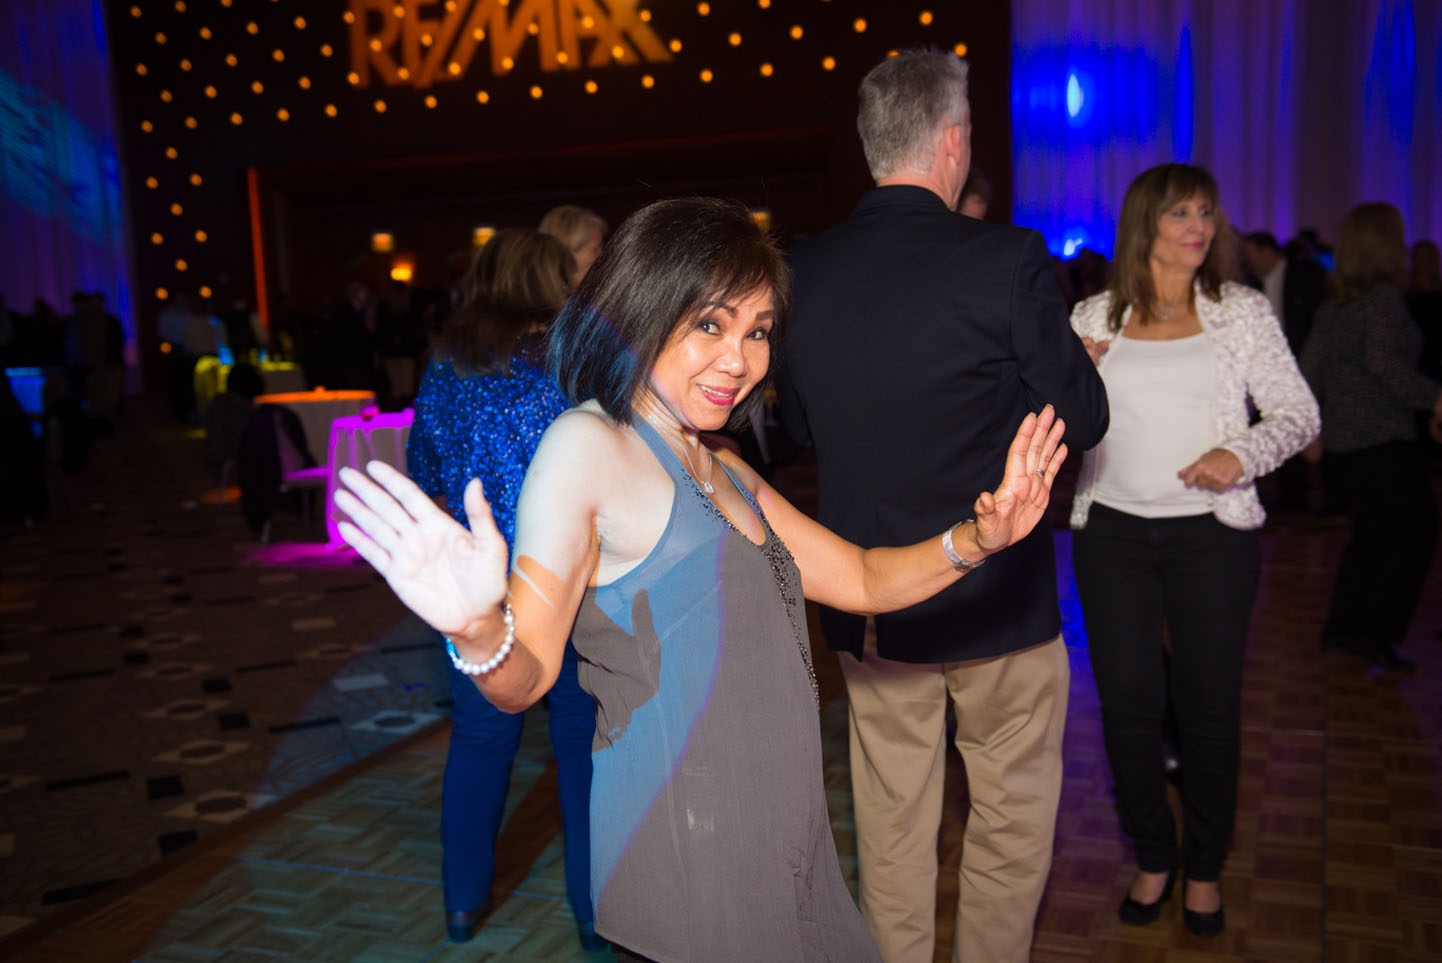 2015-12-09 ReMax Corpoarte Event - The Borgata - Atlantic City NJ - Photo Sesh - 2015-5199.jpg